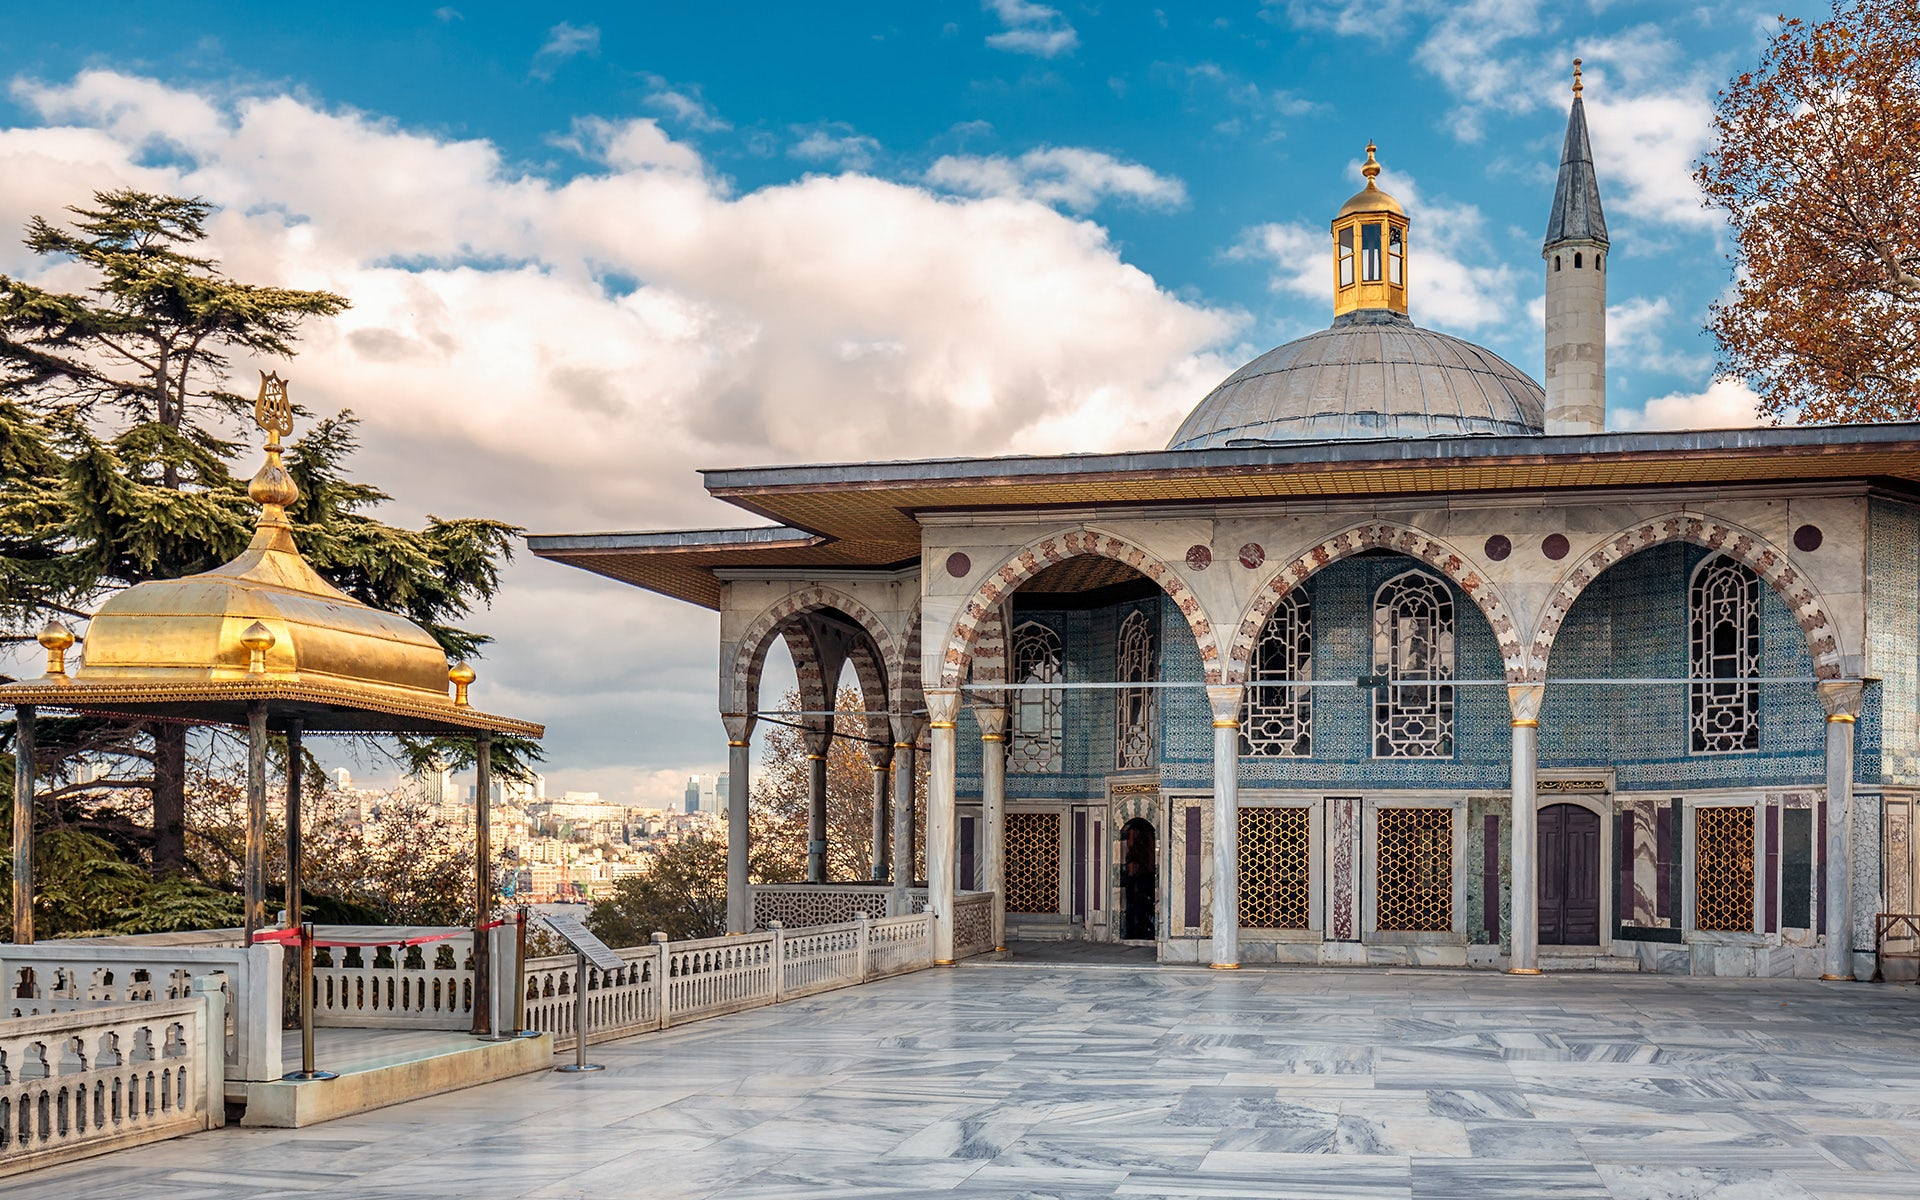 Фото дворца Топкапы